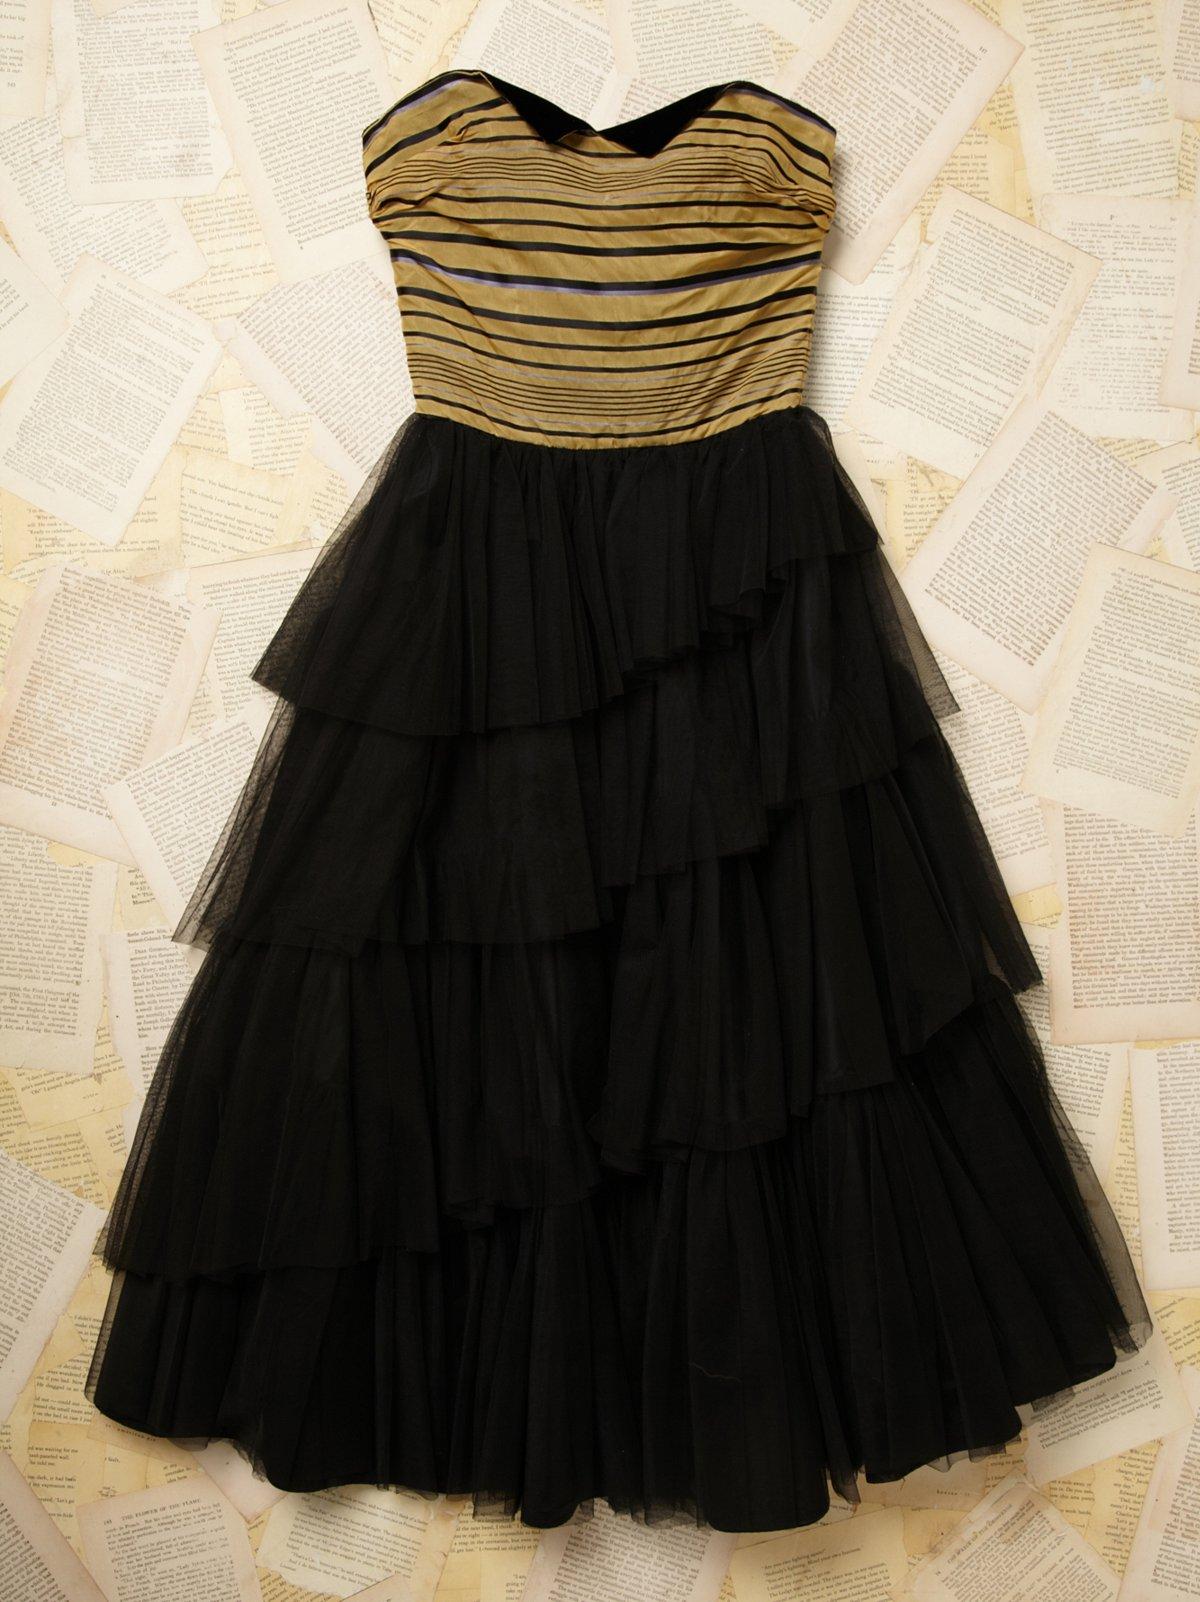 Vintage 1940s Tulle Dress